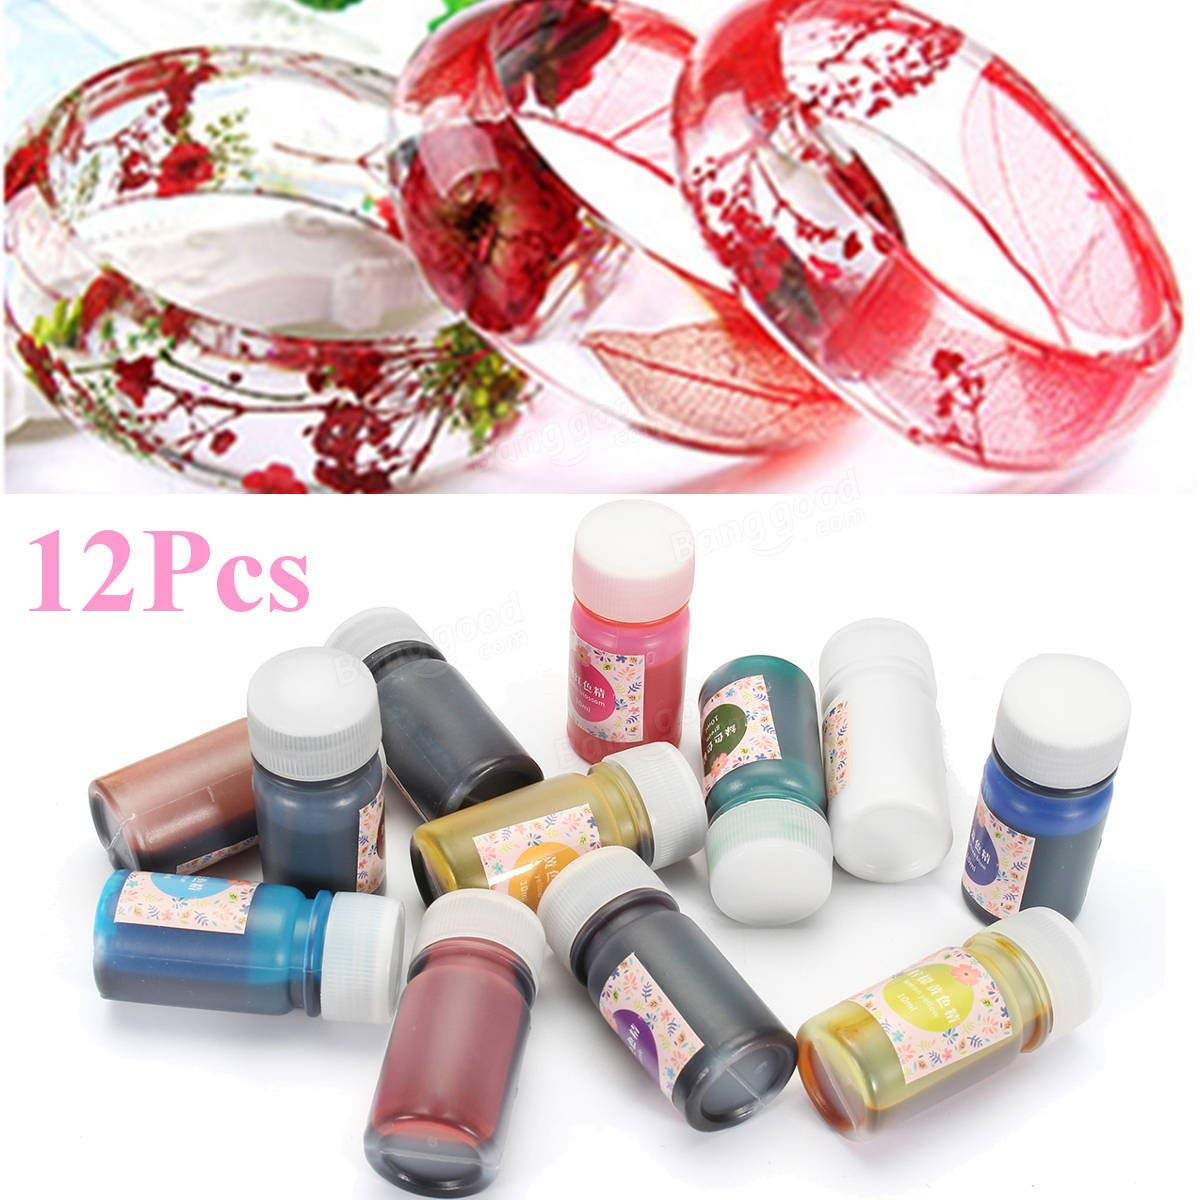 12 Color Epoxy UV Resin Coloring Dye Colorant Resin Pigment Art Crafts Mix Color - 12Pcs (10 Grams)